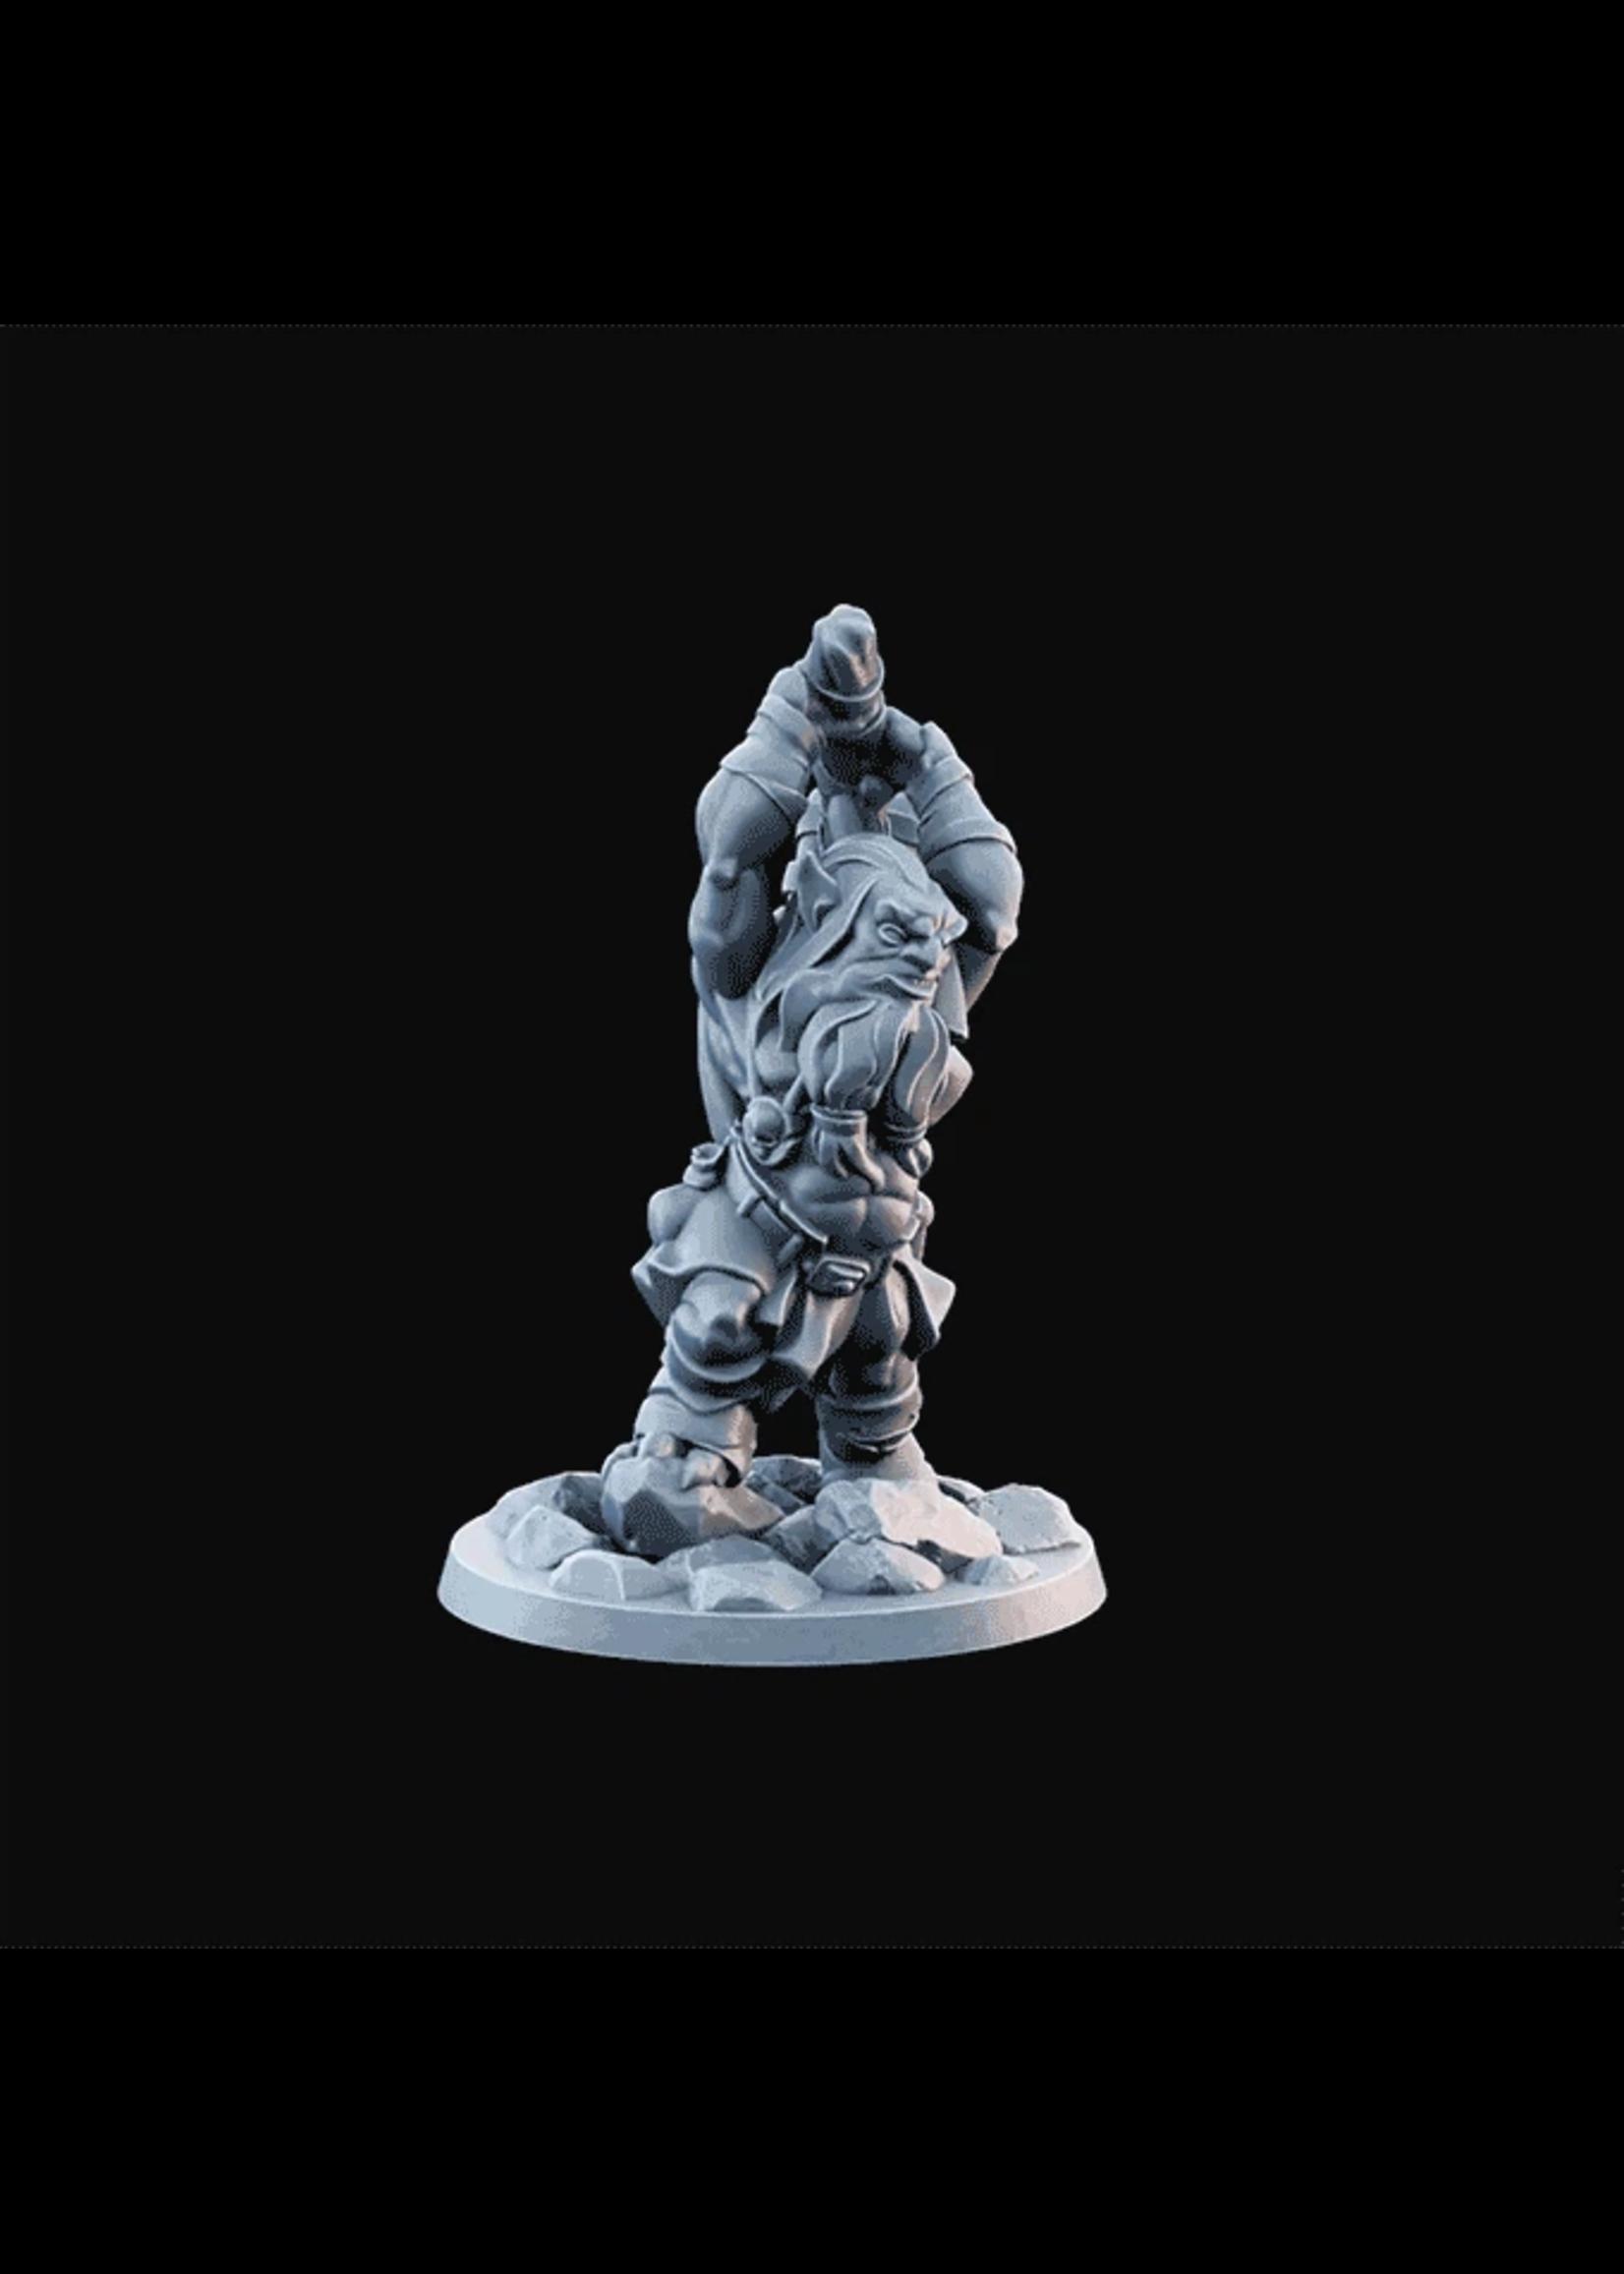 3D Printed Miniature - Goblin05  - Dungeons & Dragons - Desolate Plains KS